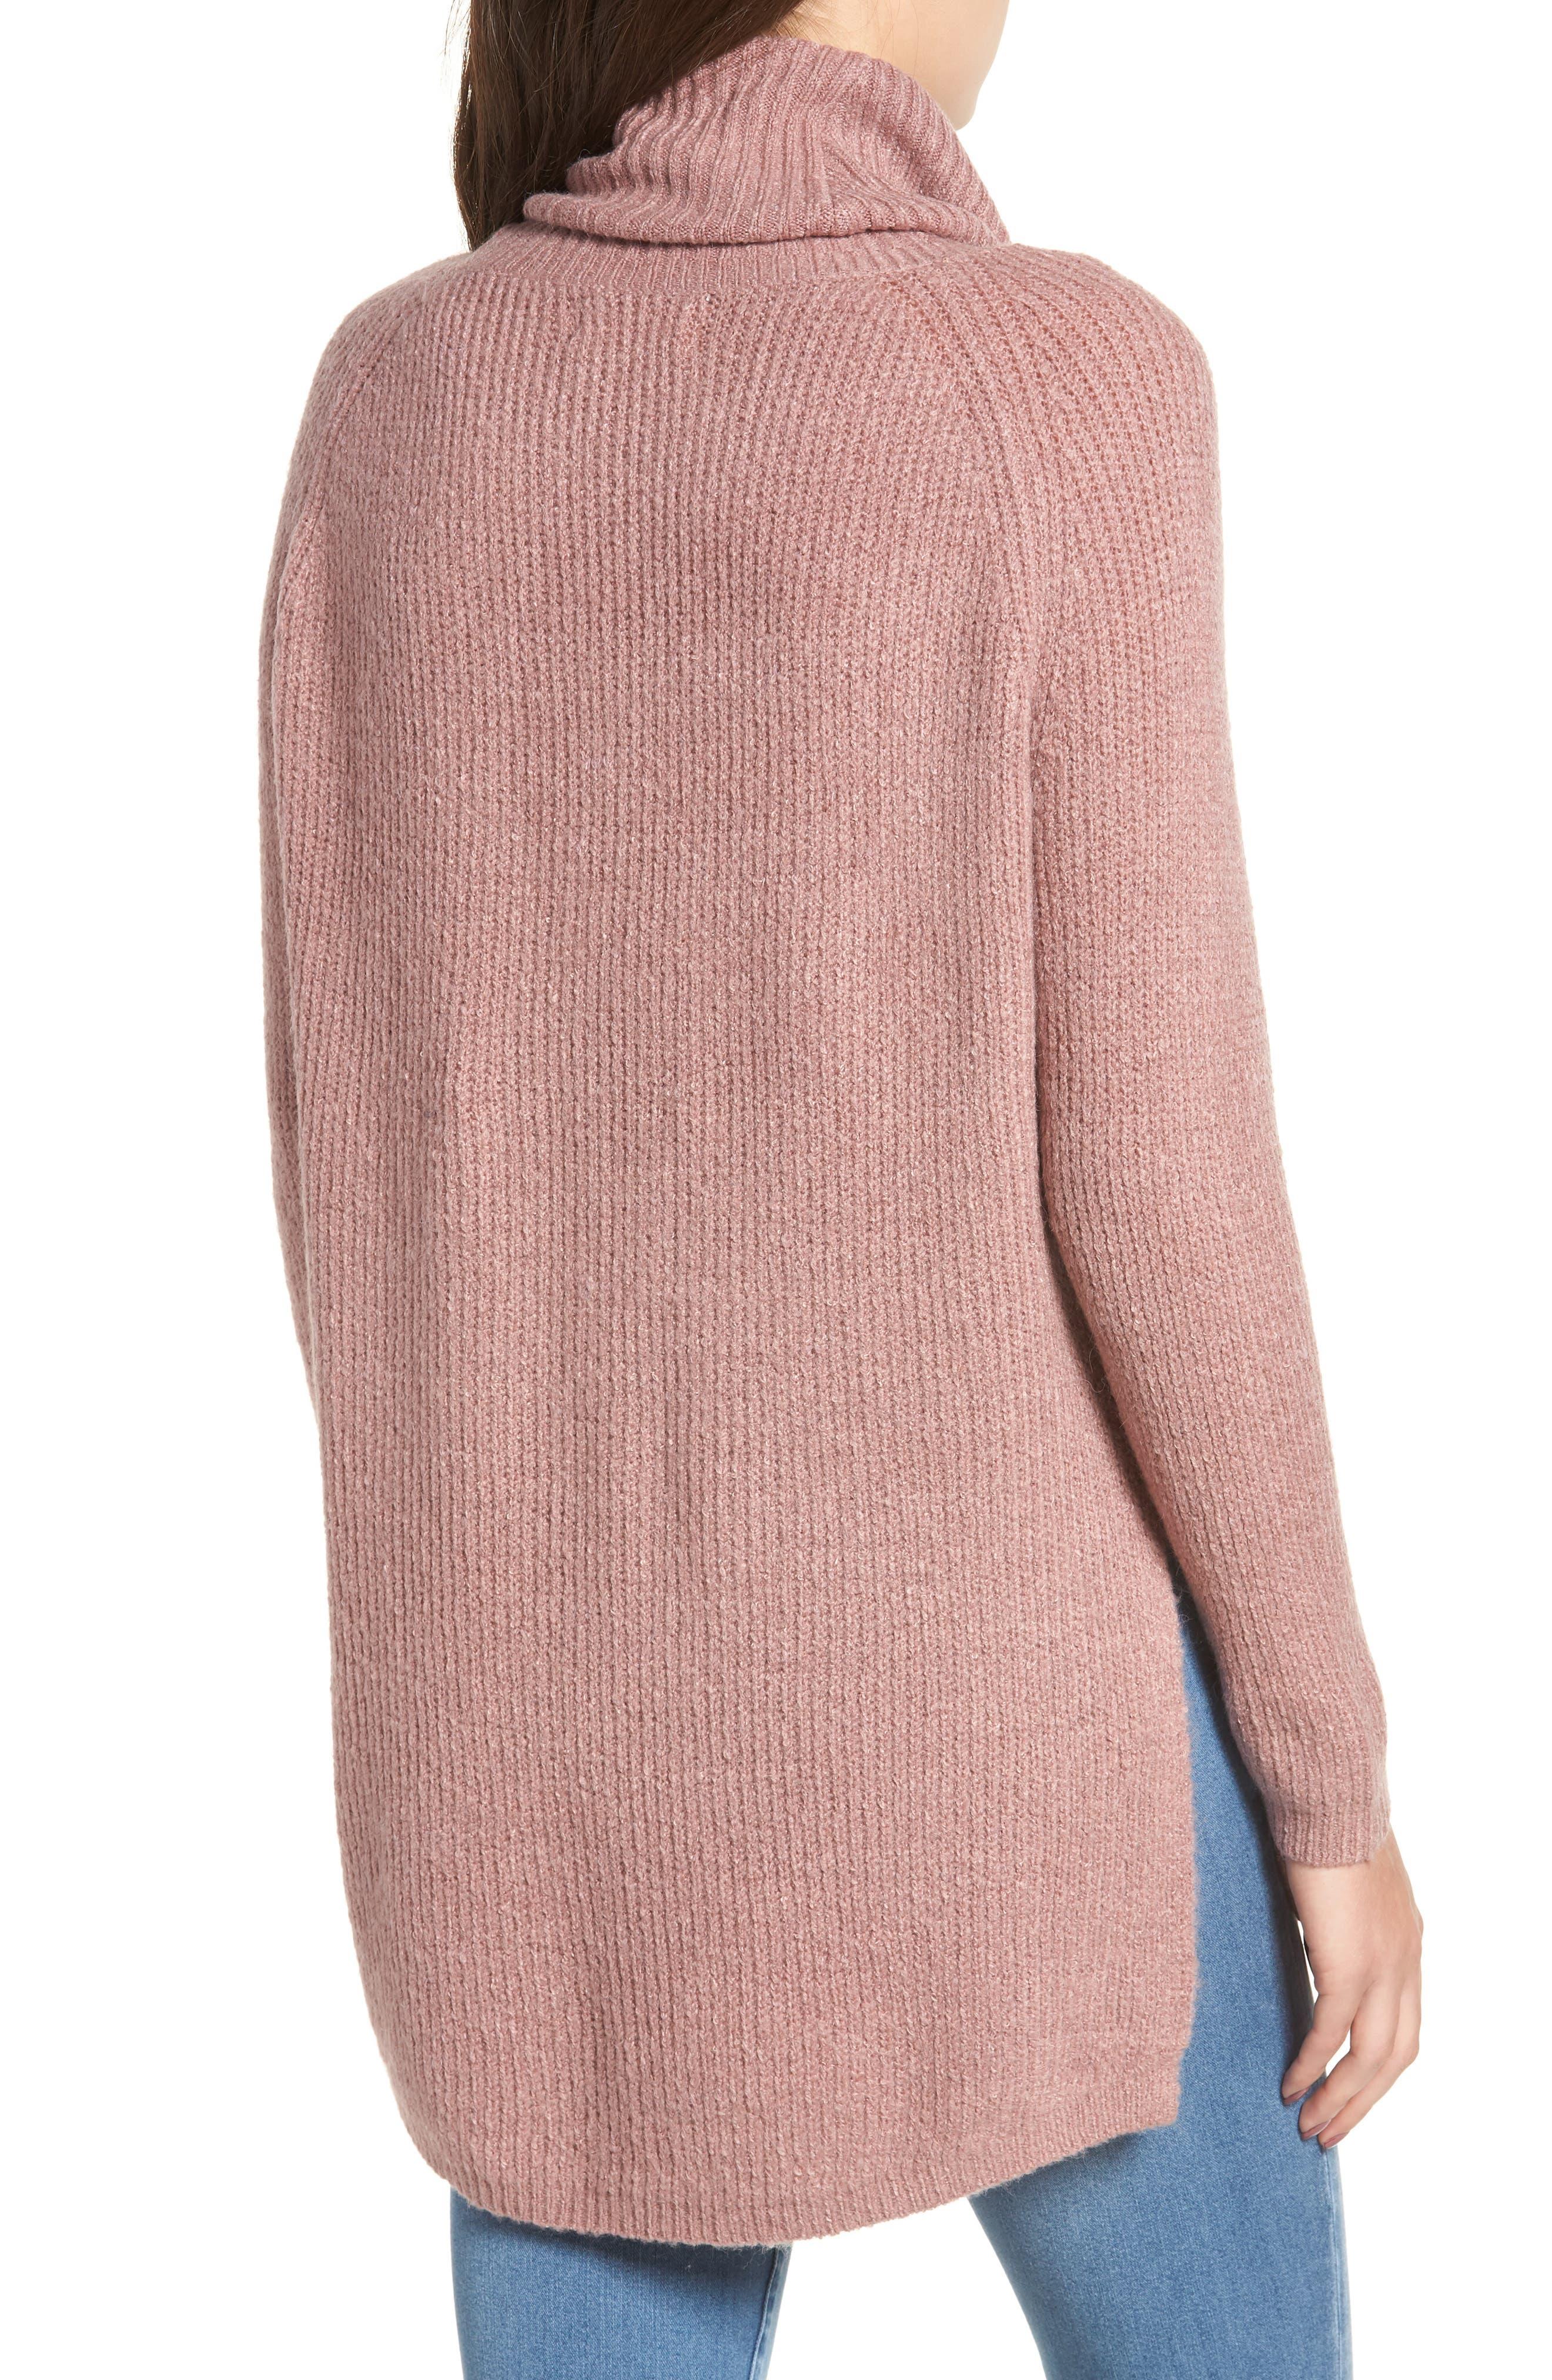 Cowl Neck Sweater,                             Alternate thumbnail 2, color,                             500